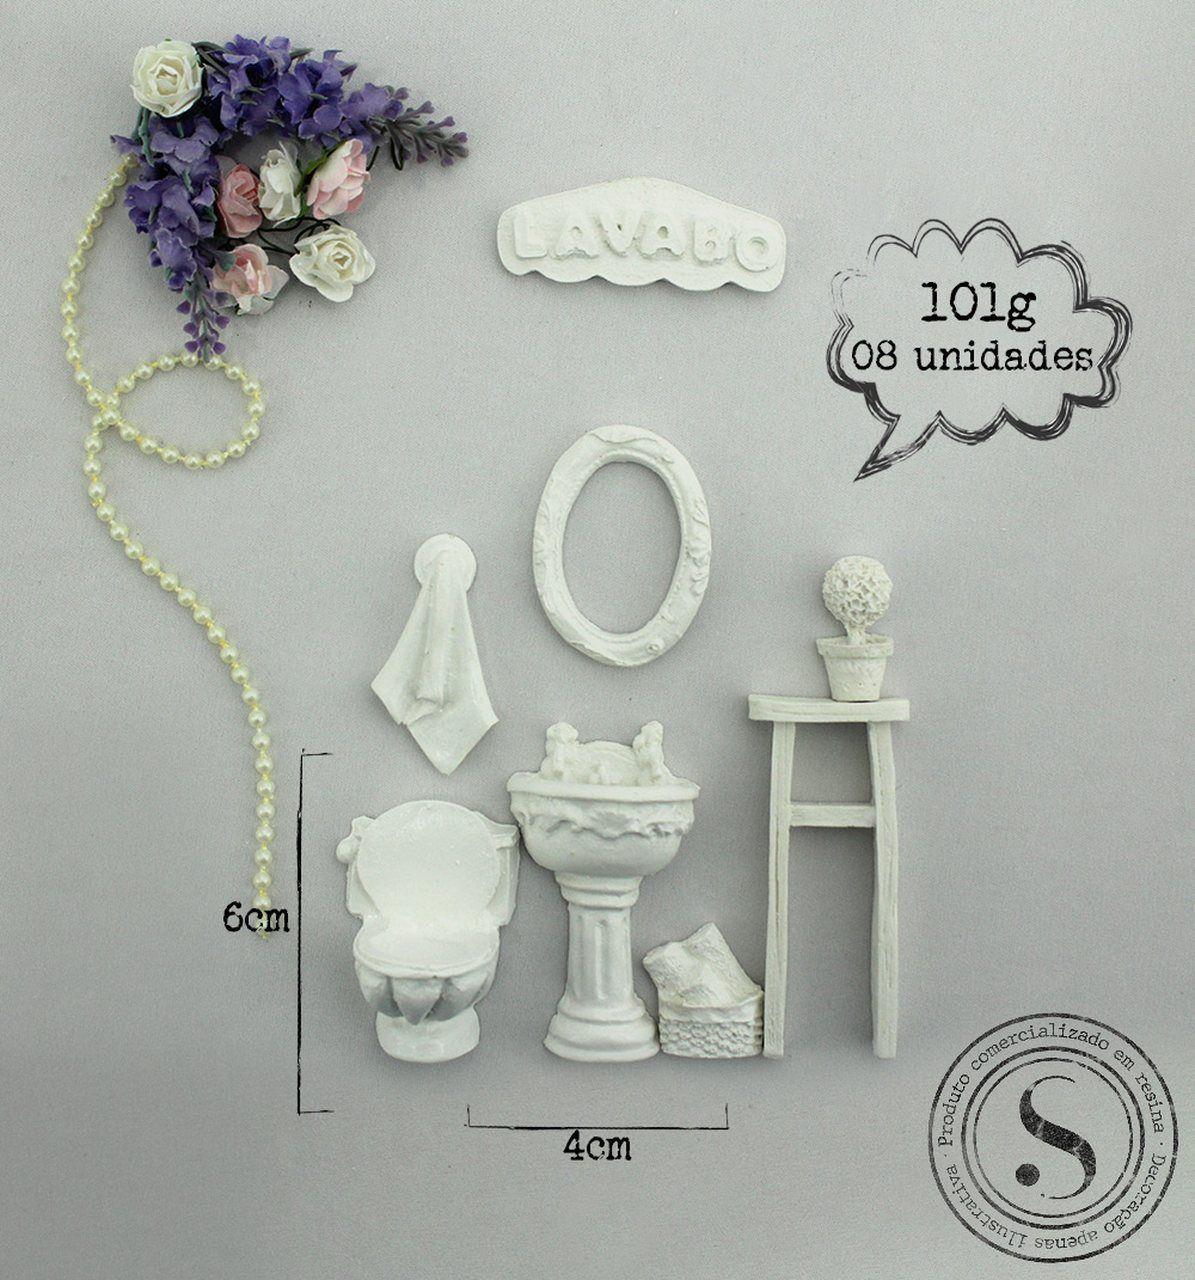 Aplique Resina Kit Banheiro Lavabo  - KH002 - Sandra Gotardo